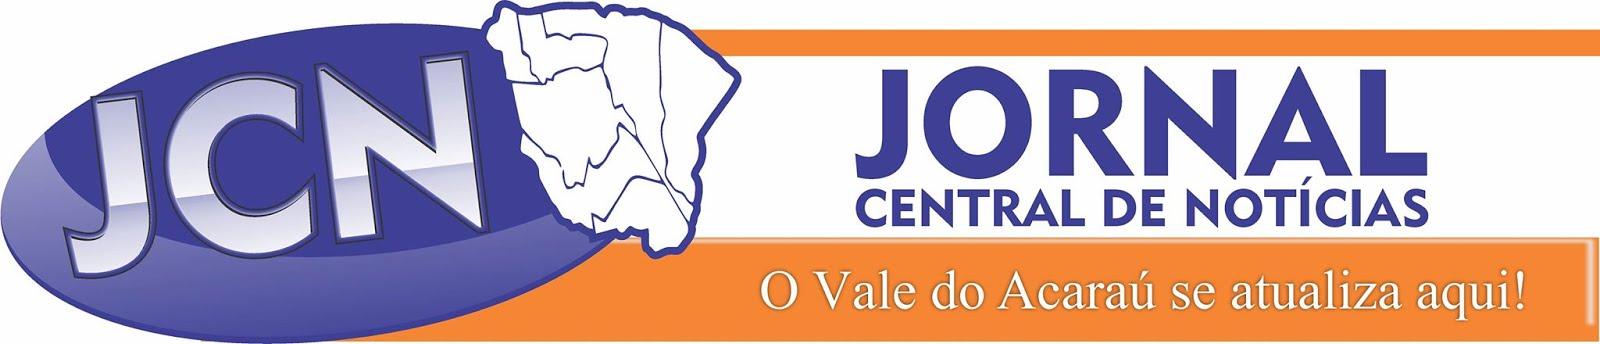 Jornal Central de Noticias